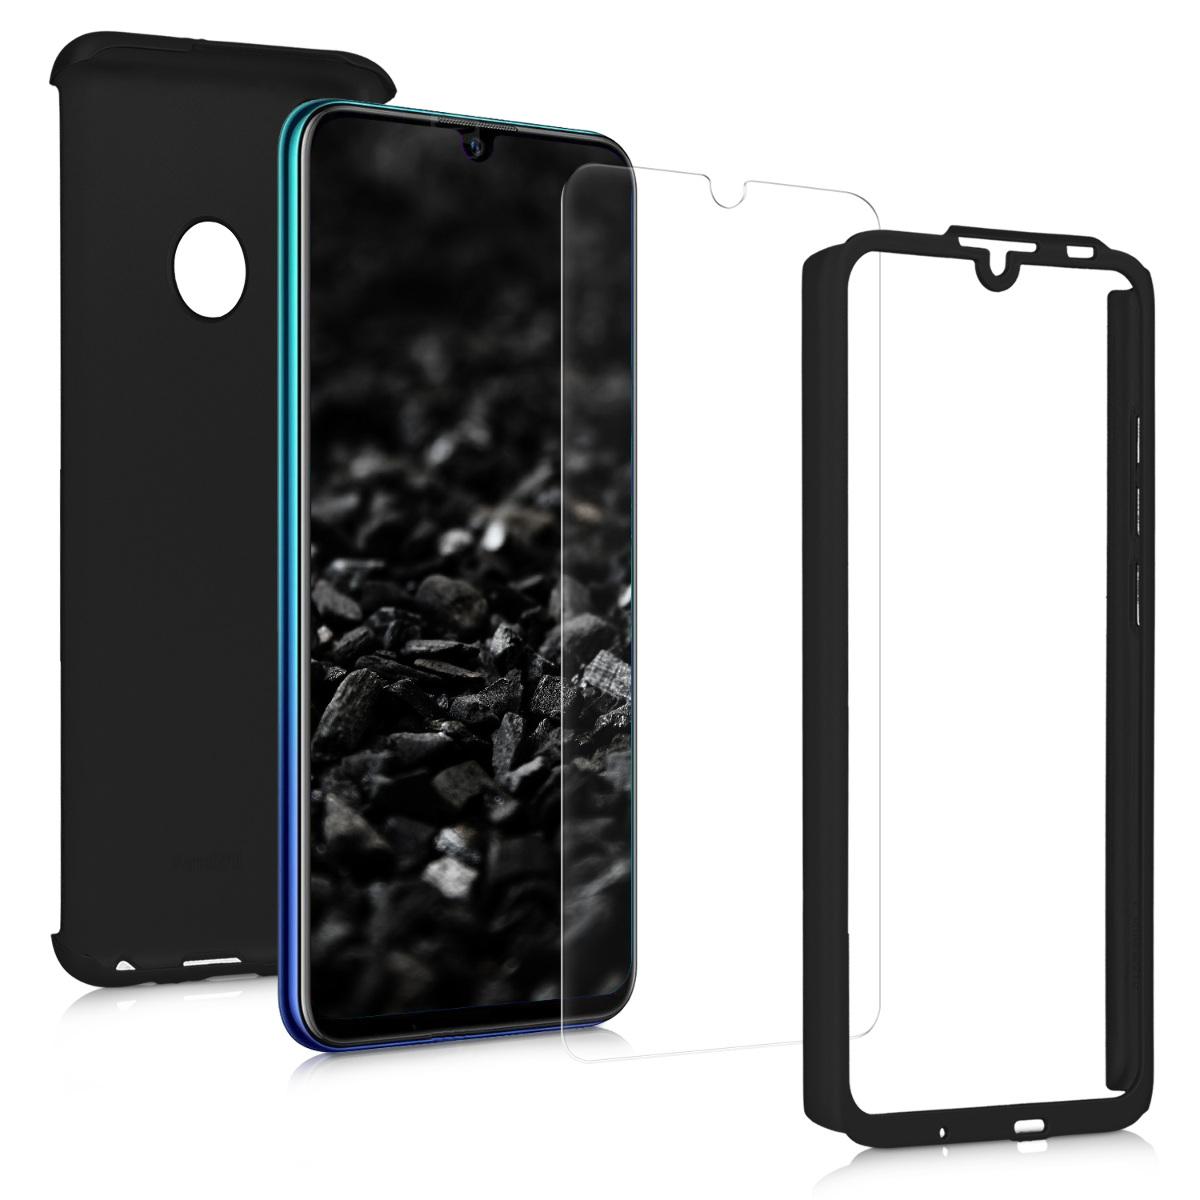 KW Θήκη Full Body Huawei P Smart 2019 & Tempered Glass - Metallic Black (47391.68)